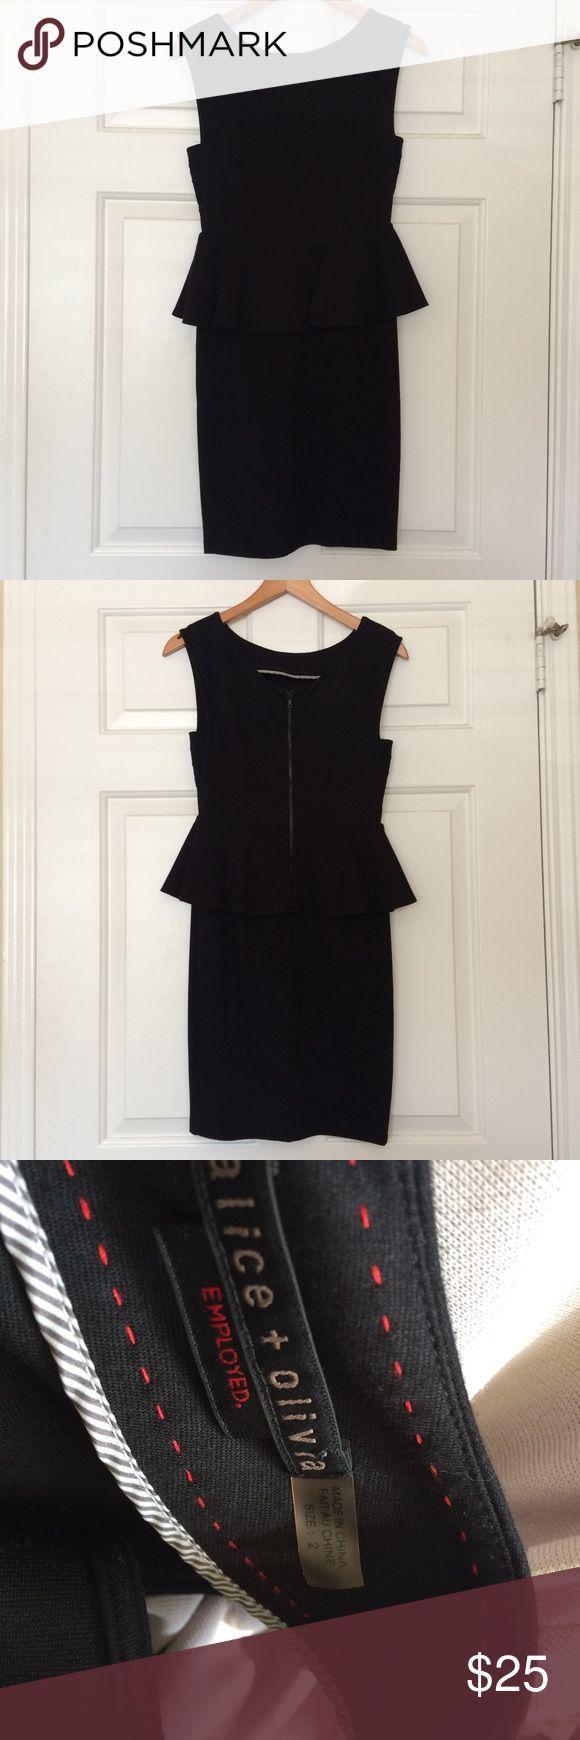 Alice + Olivia dress Alice + Olivia black peplum dress, zipper in back, quality  fabric is still in good condition Alice + Olivia Dresses